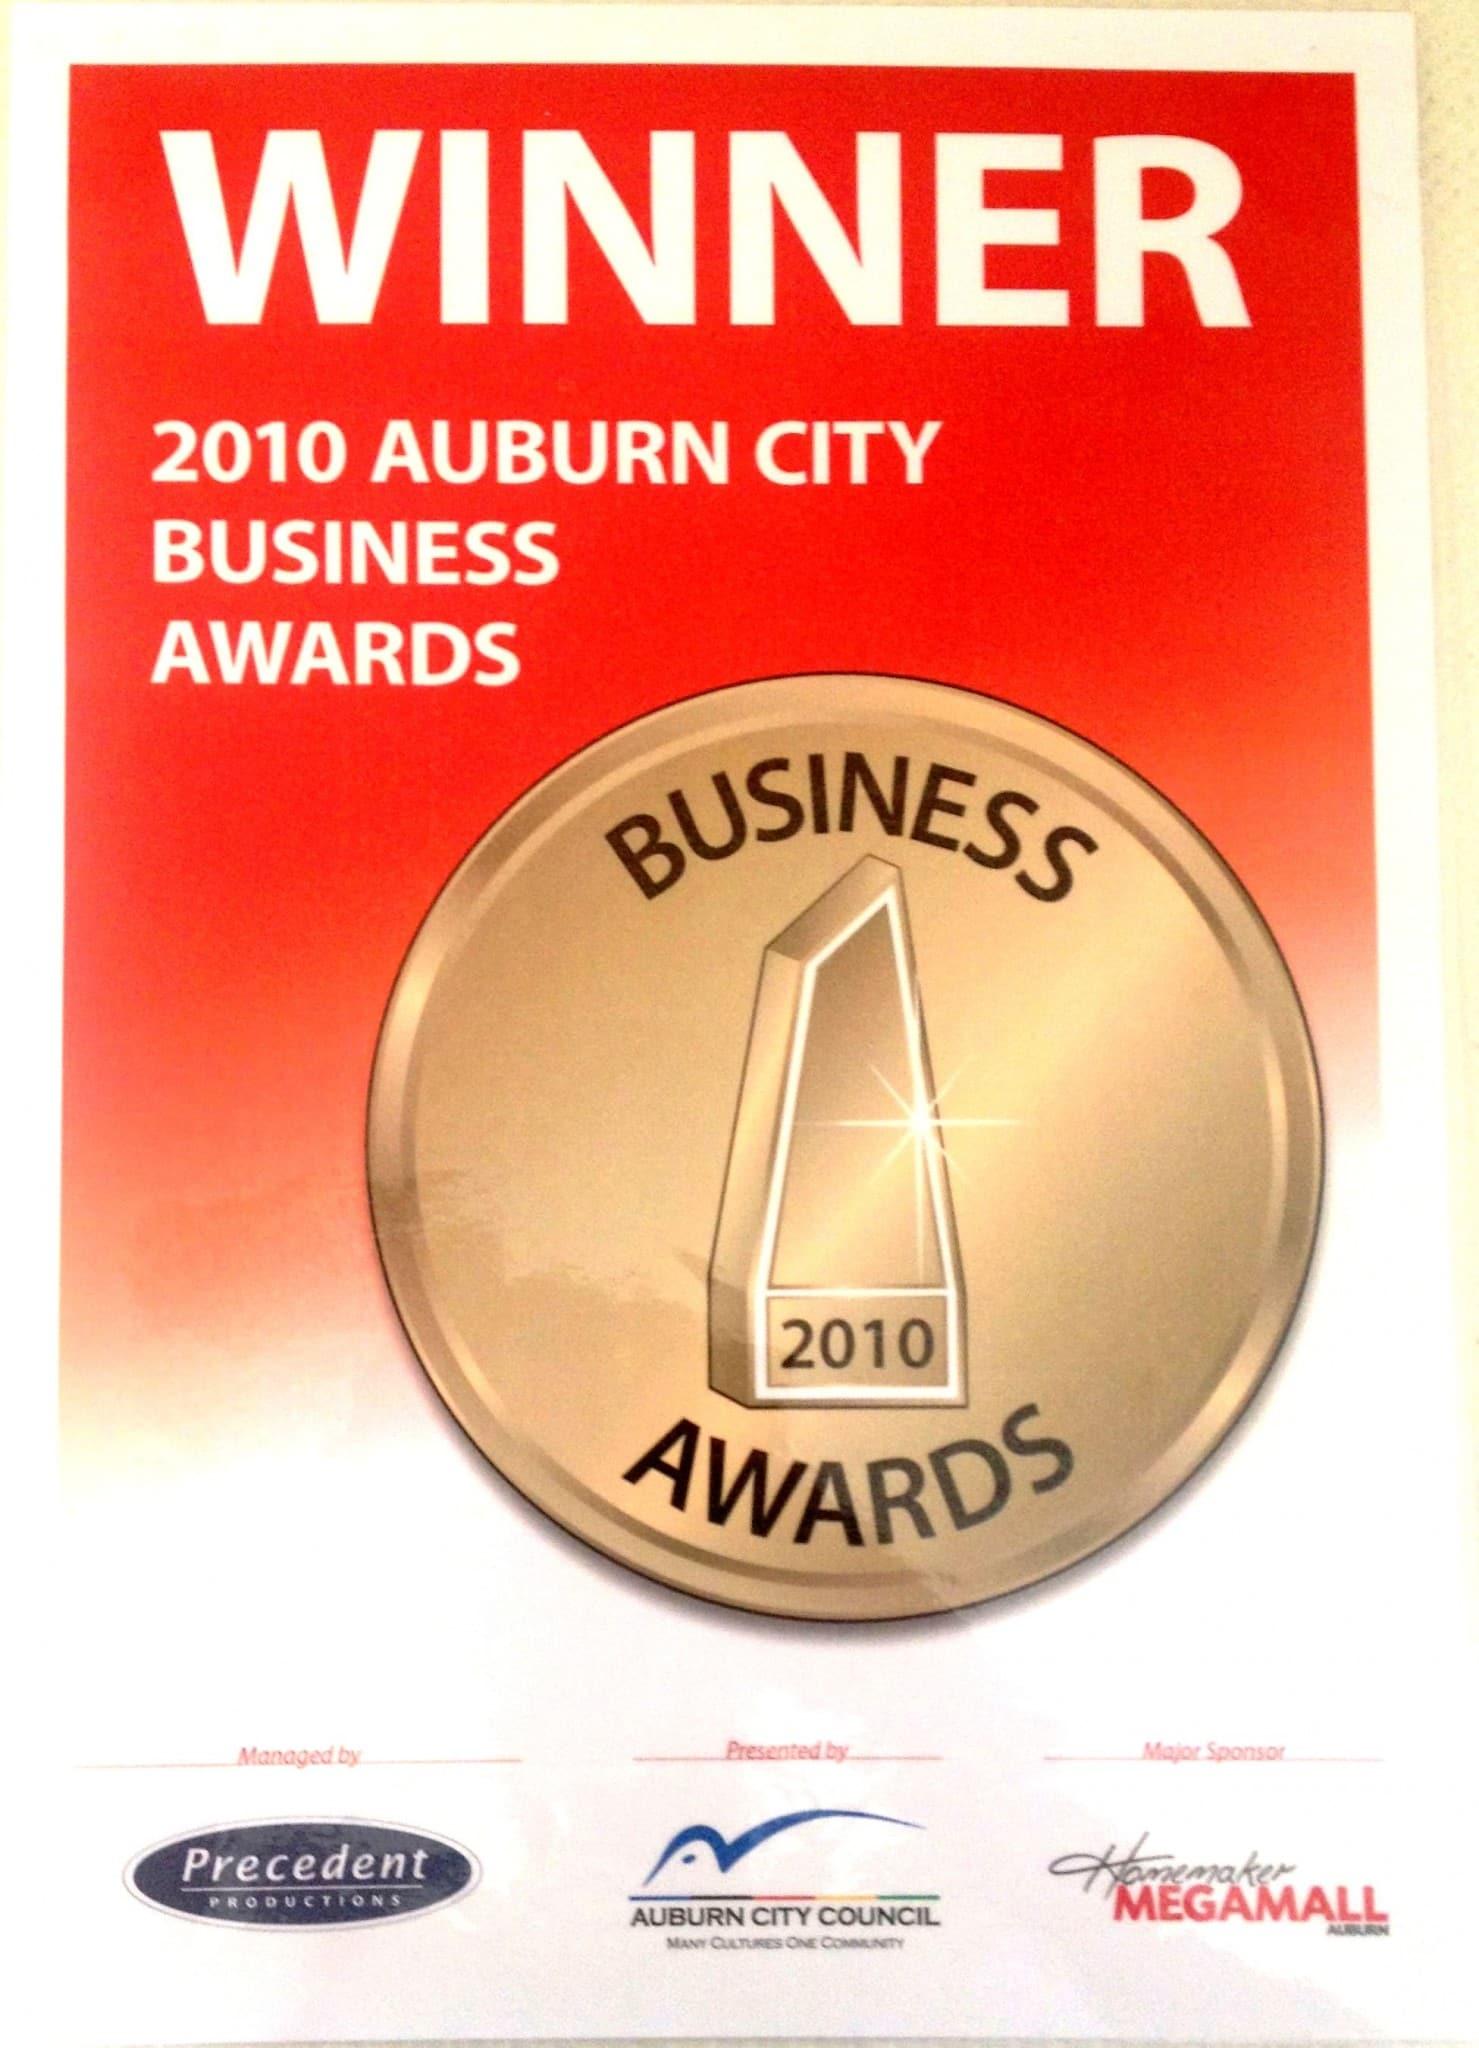 Local Business Award - 2010